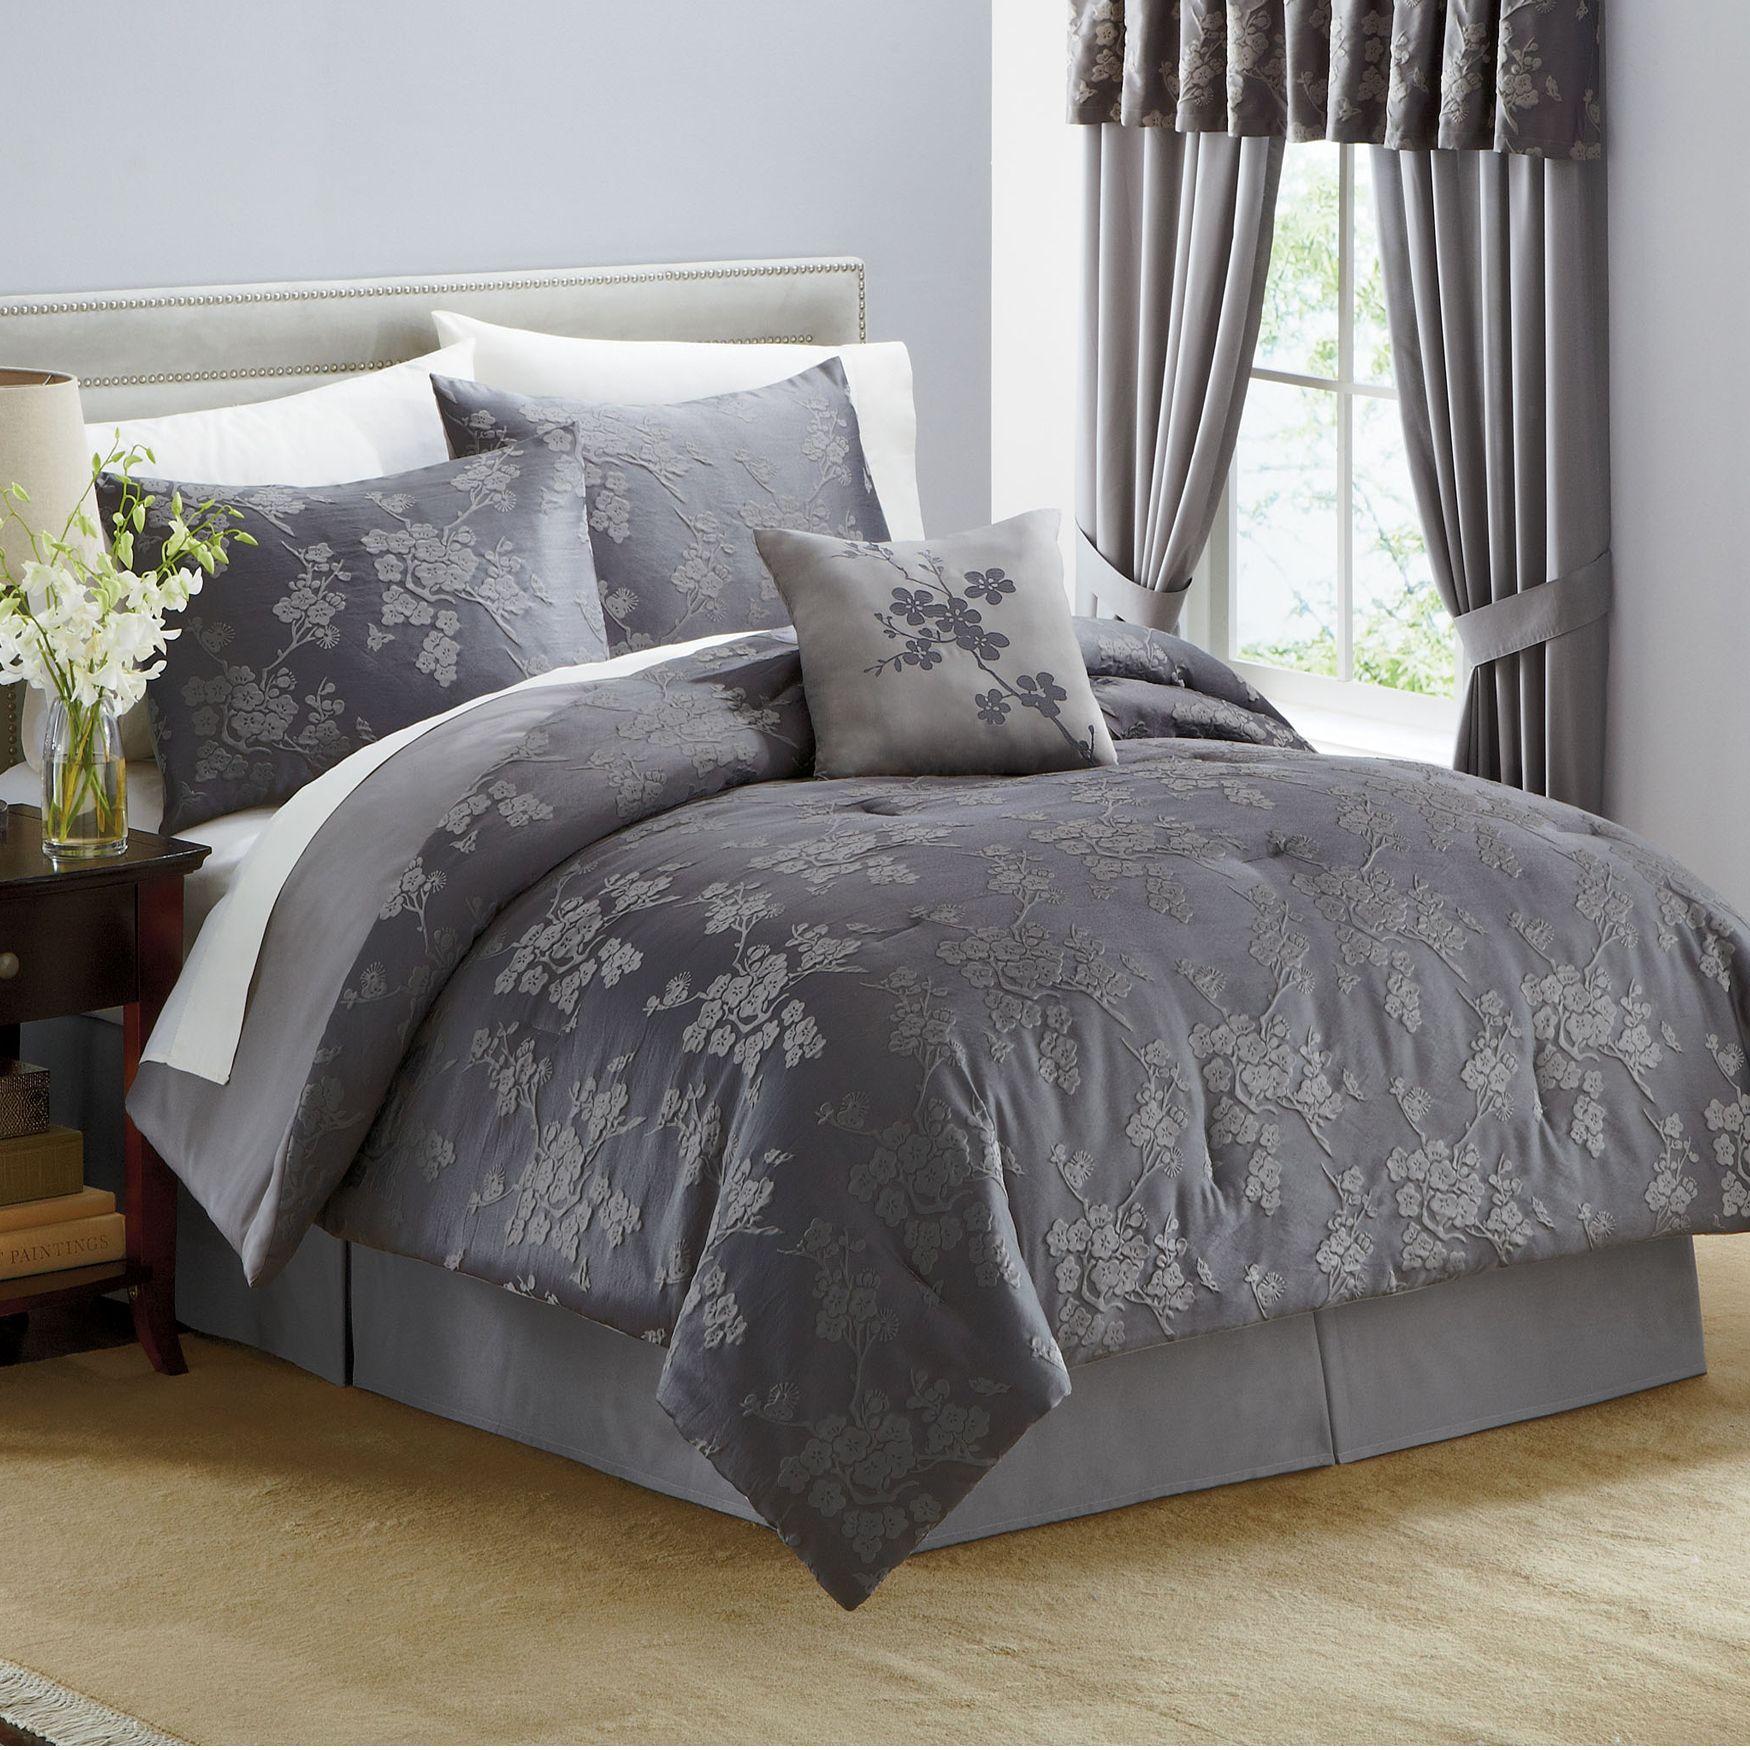 Jasmina 4-Pc. Comforter Set Collection | Comforters ...